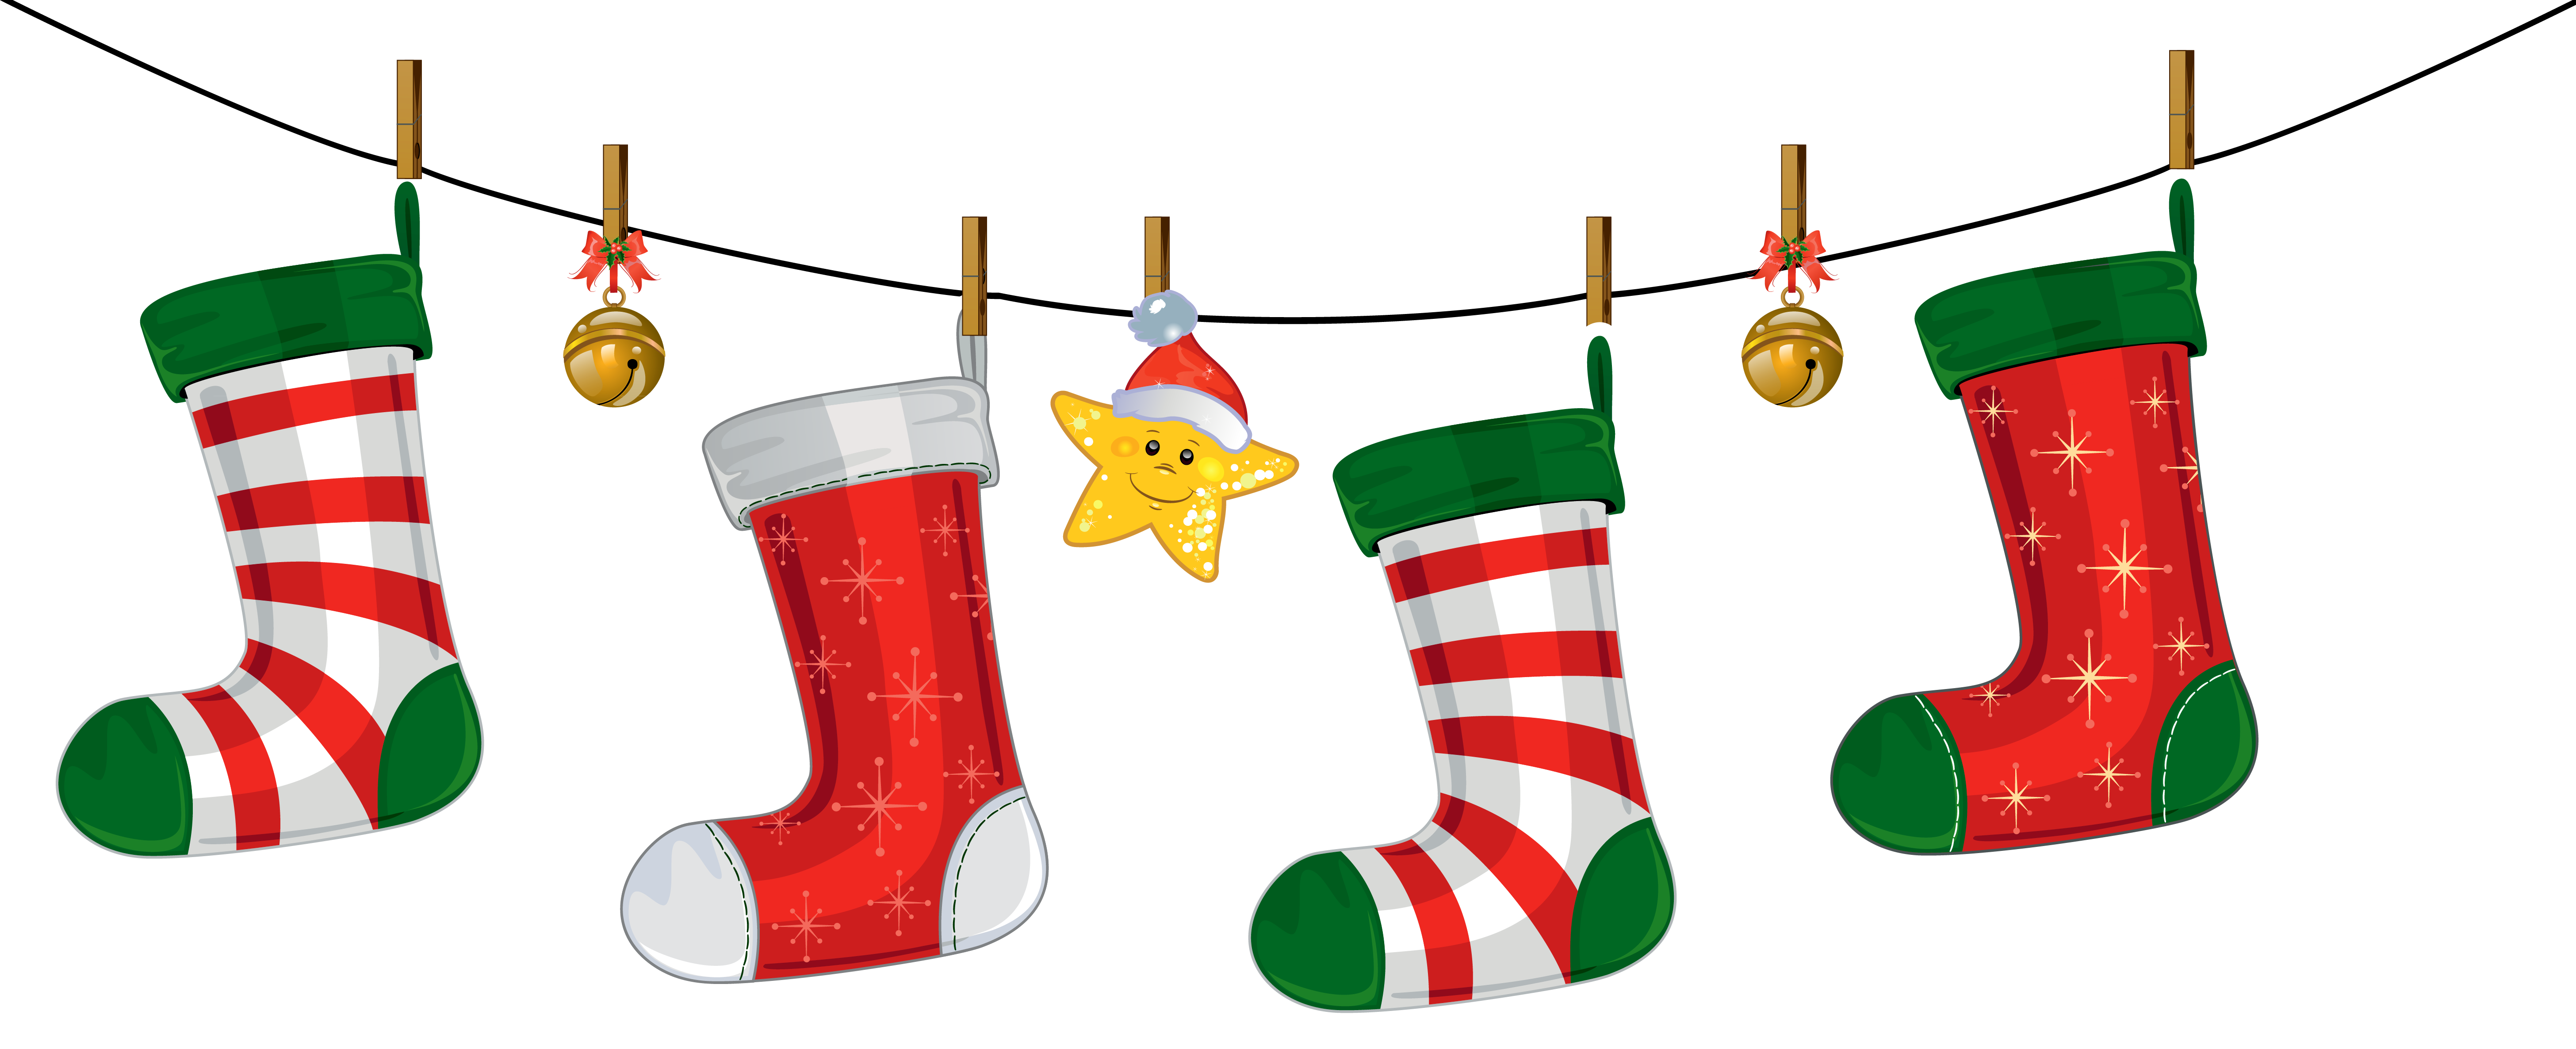 Transparent Christmas Stockings Decorati-Transparent Christmas Stockings Decoration Png Clipart Japoland-16